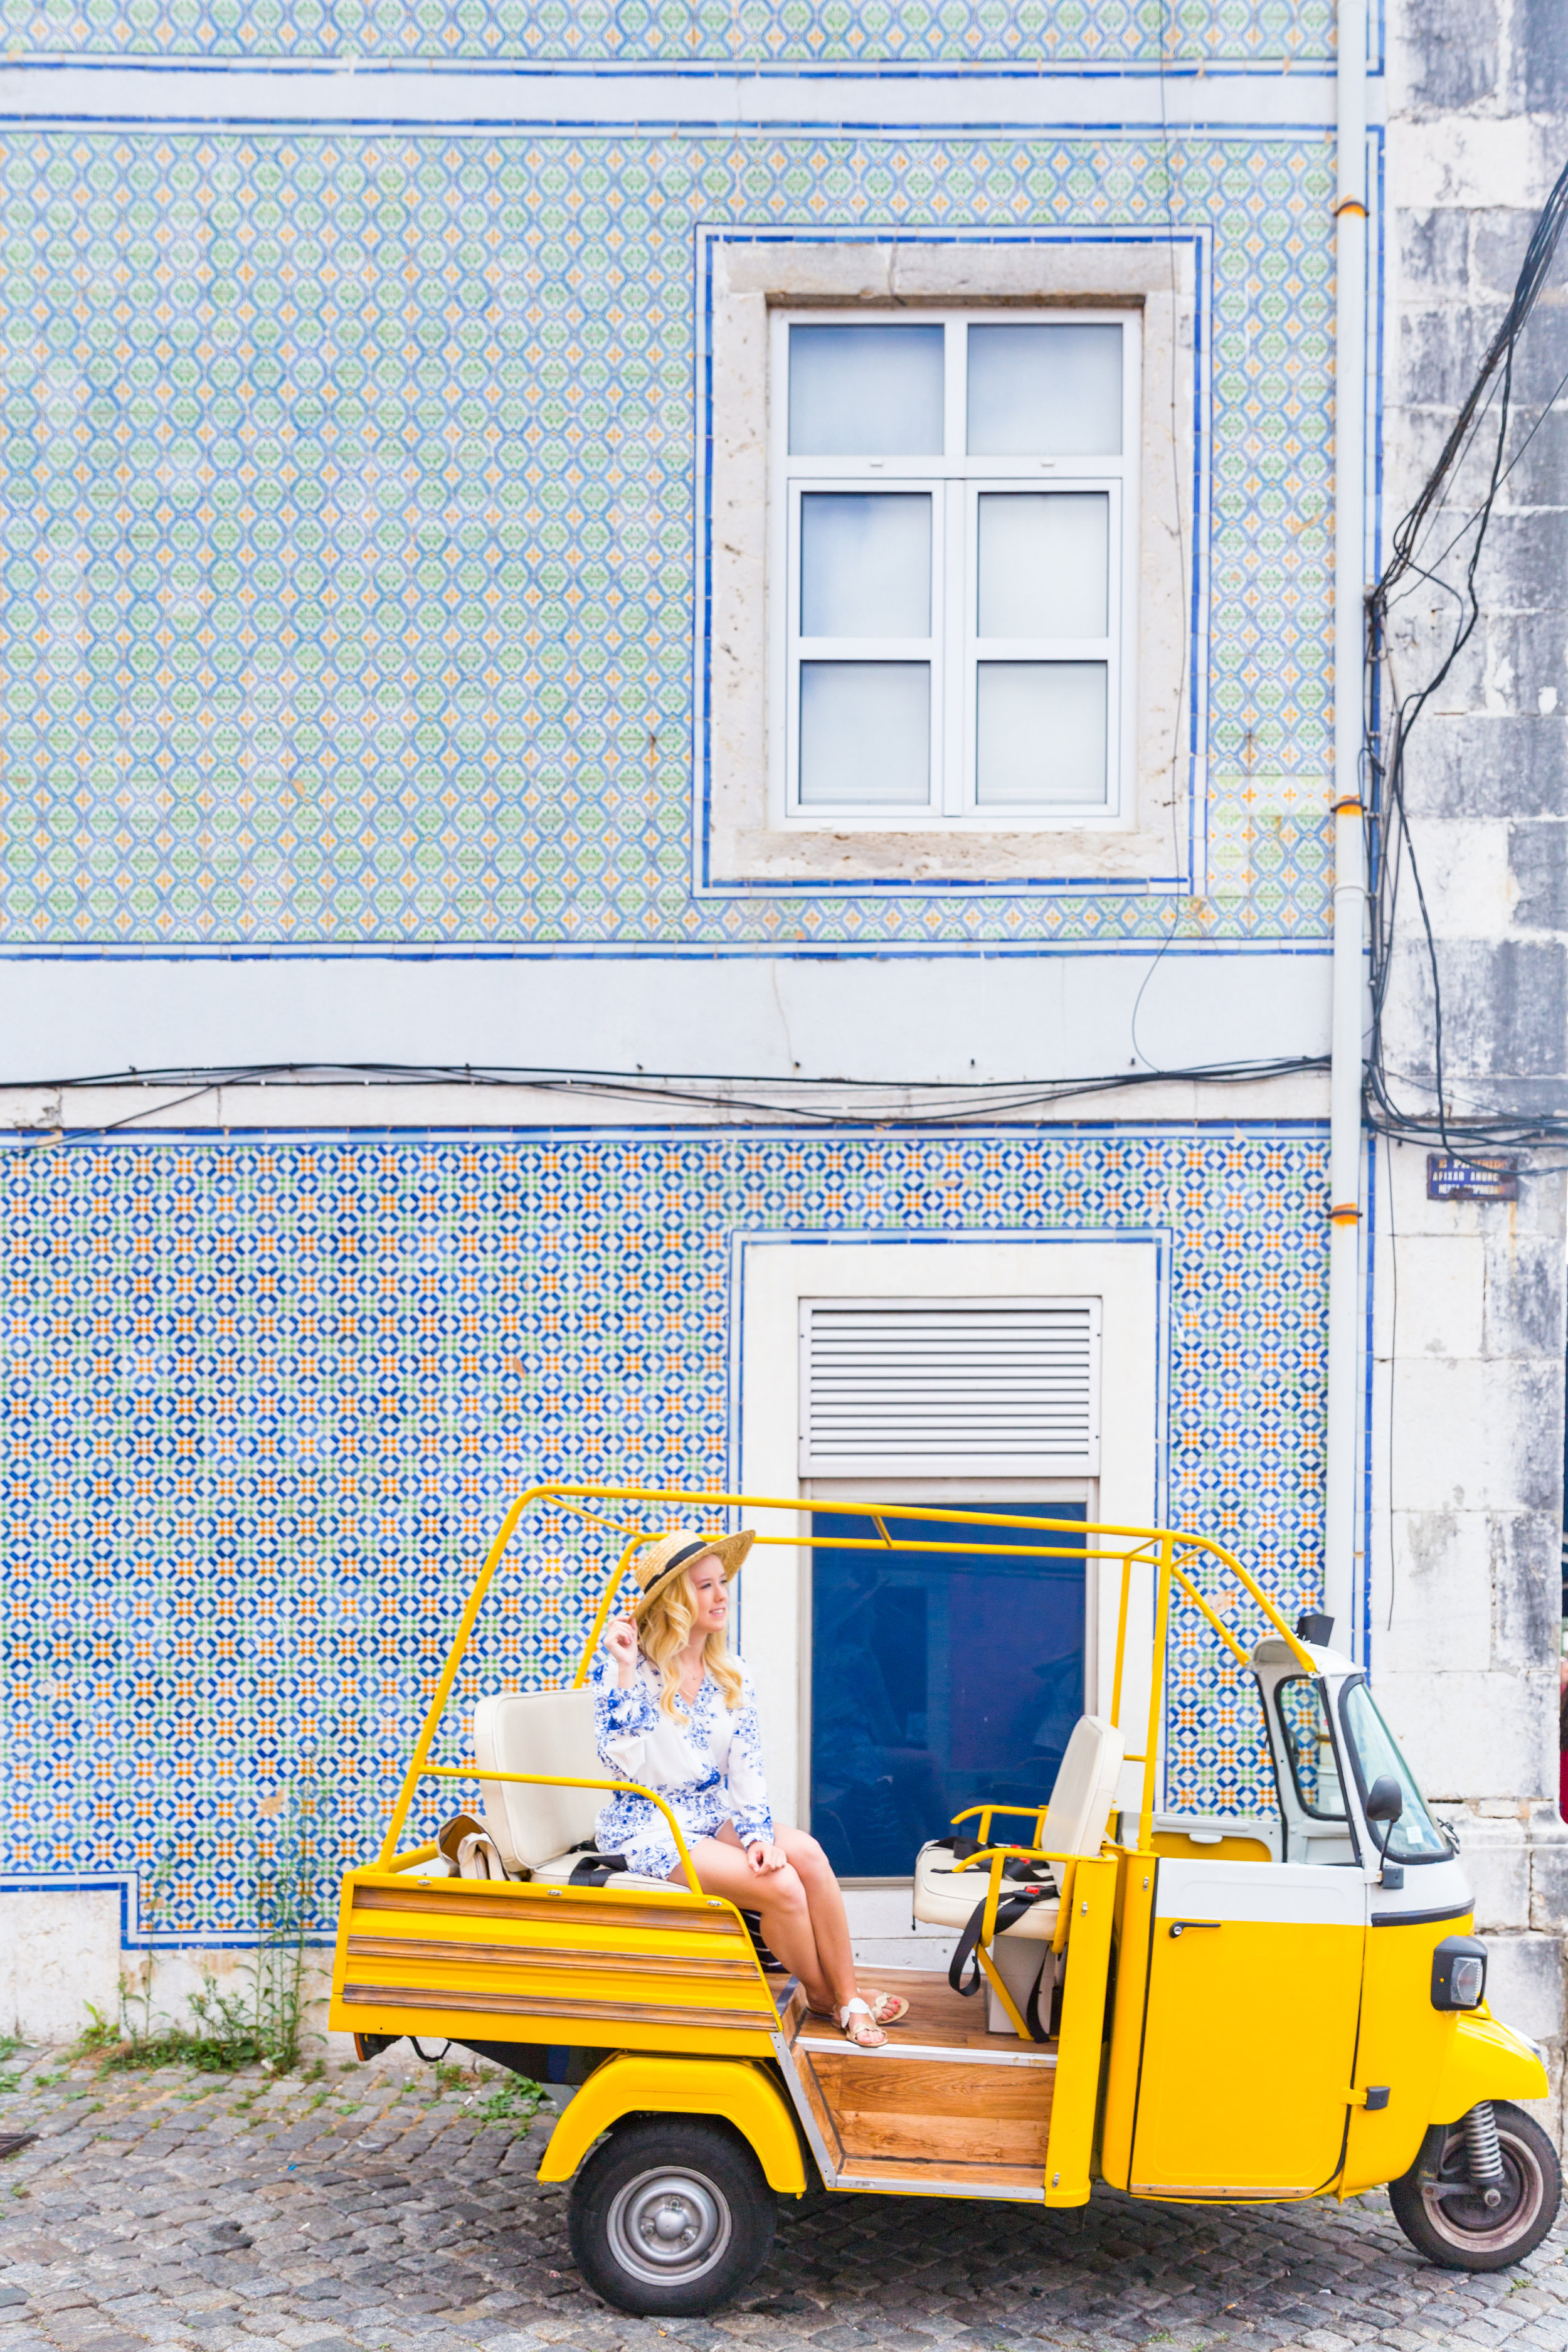 Lisbon Portugal Summer Blue and White Romper Fashion_-2.jpg